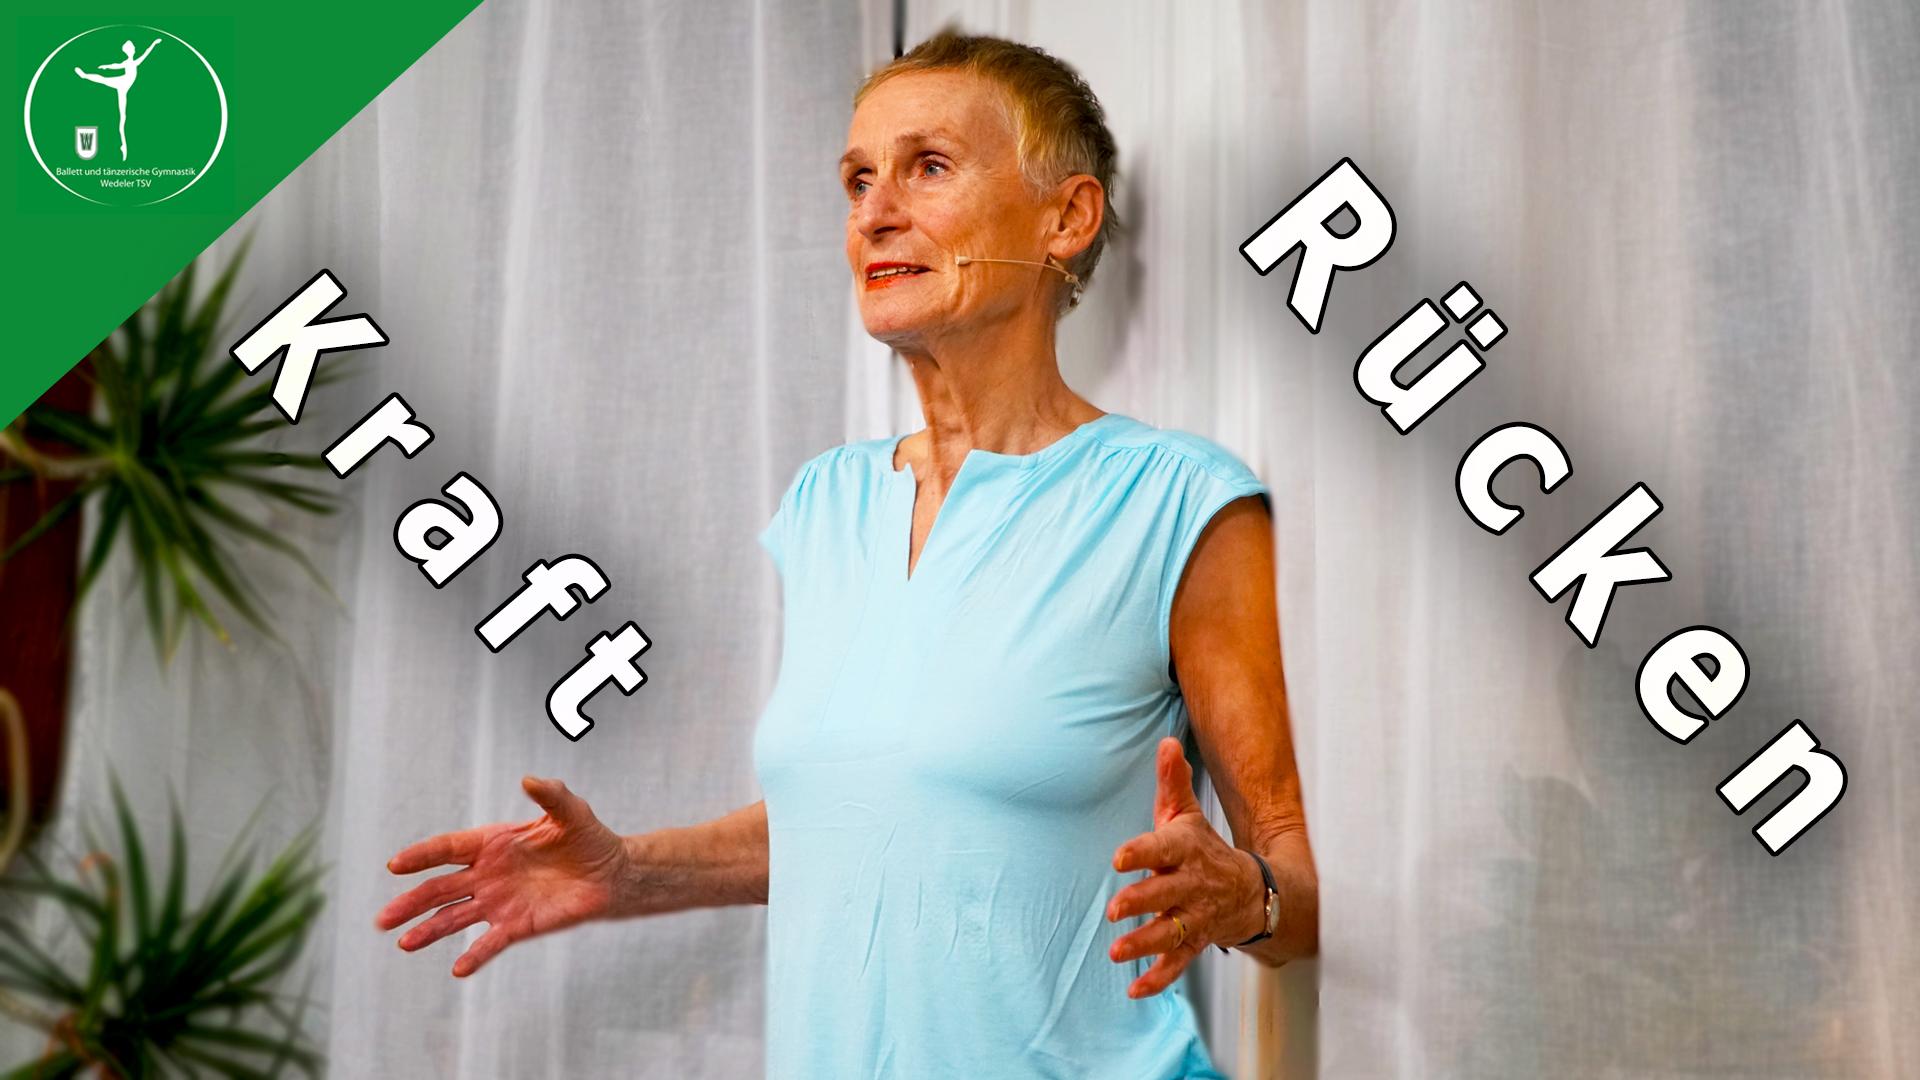 8 Min Rückenkraft u. Flexibilität ohne Geräte